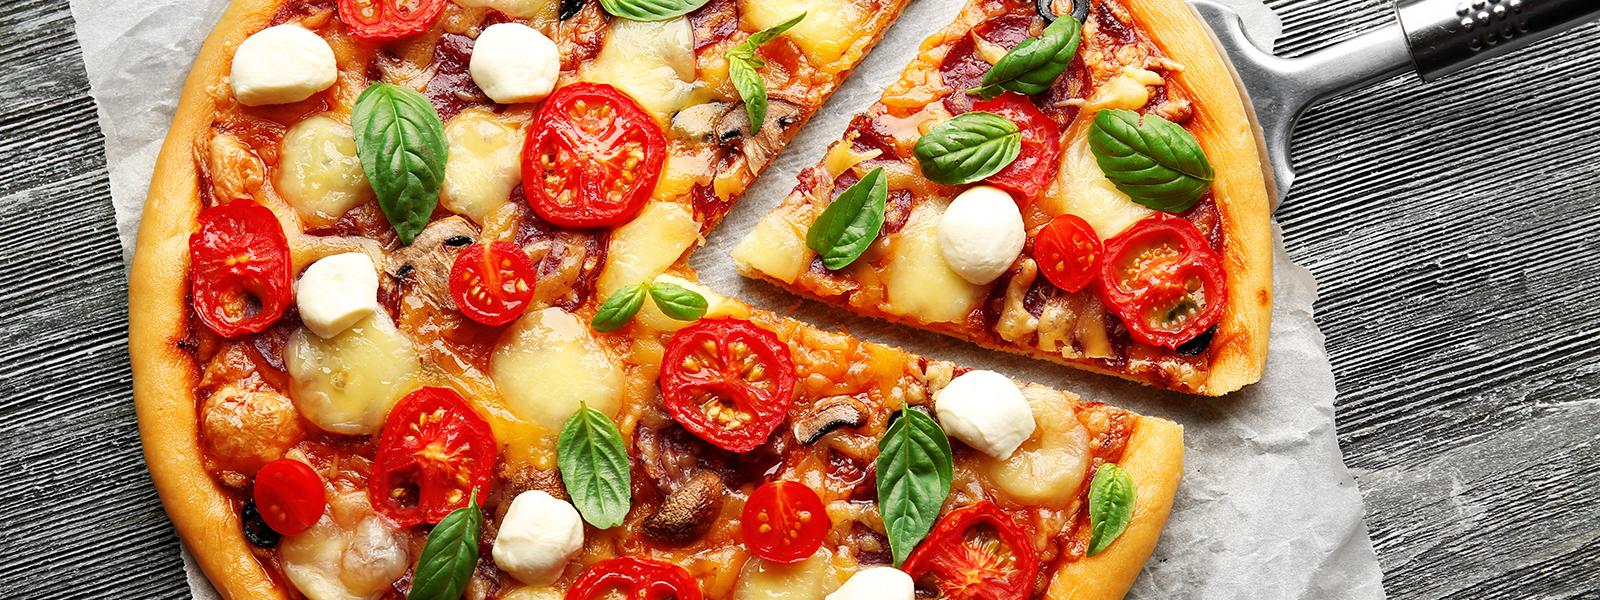 Everest Tandoori Takeaway Order Online Worksop Pizzas